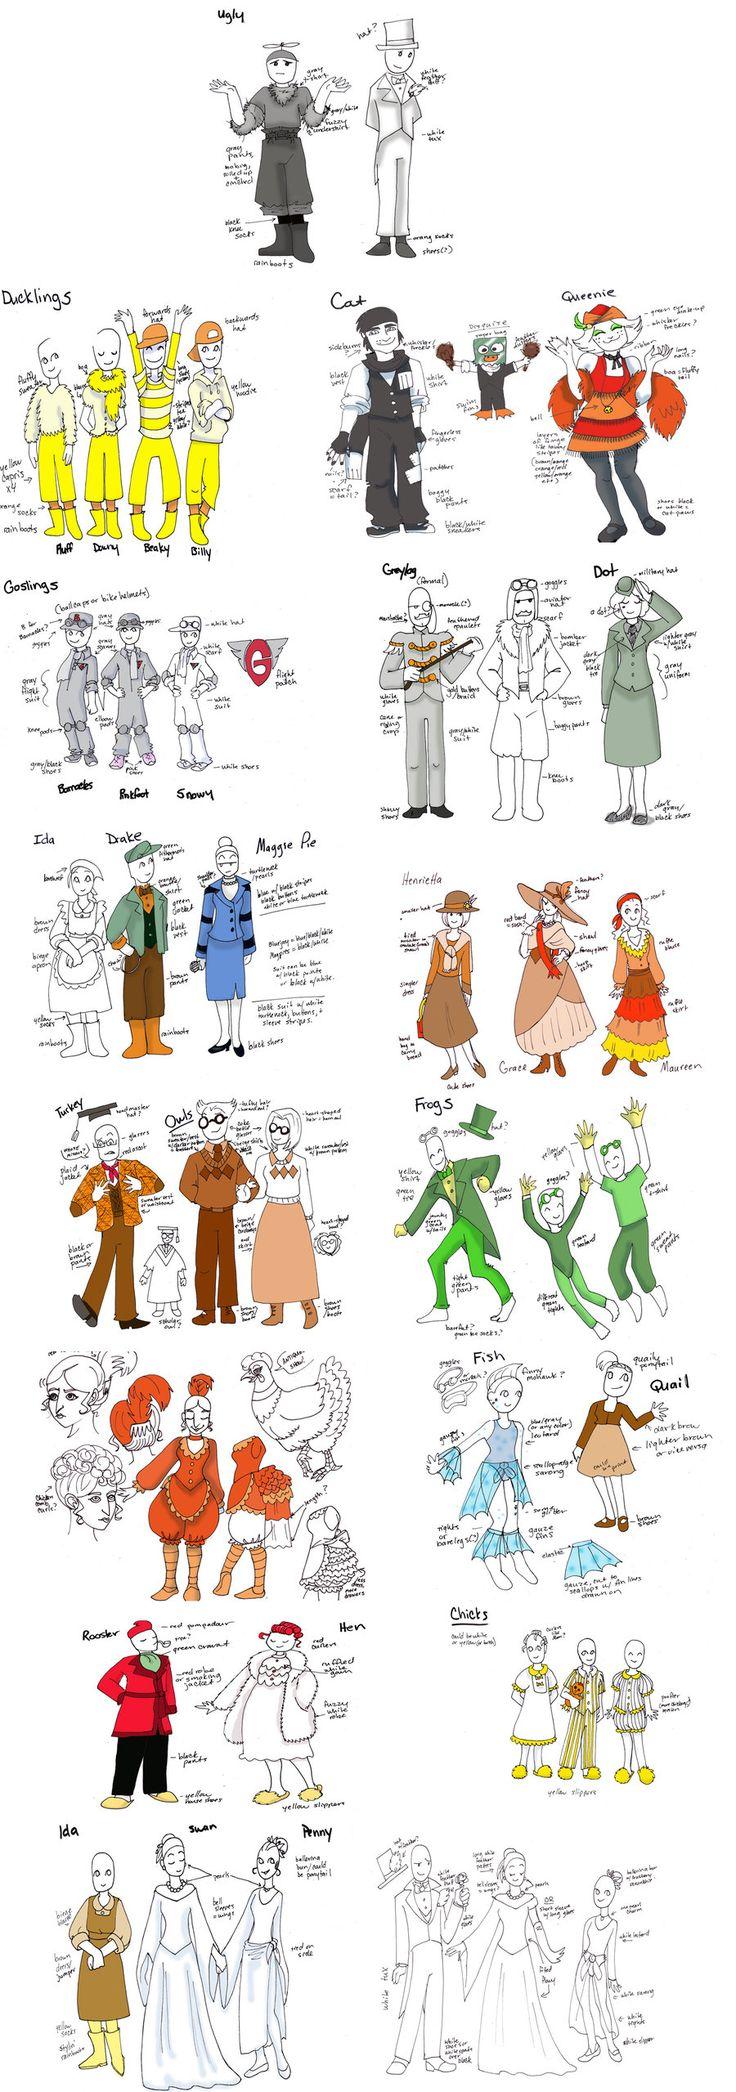 costumes for Honk! by hermitchild.deviantart.com on @DeviantArt